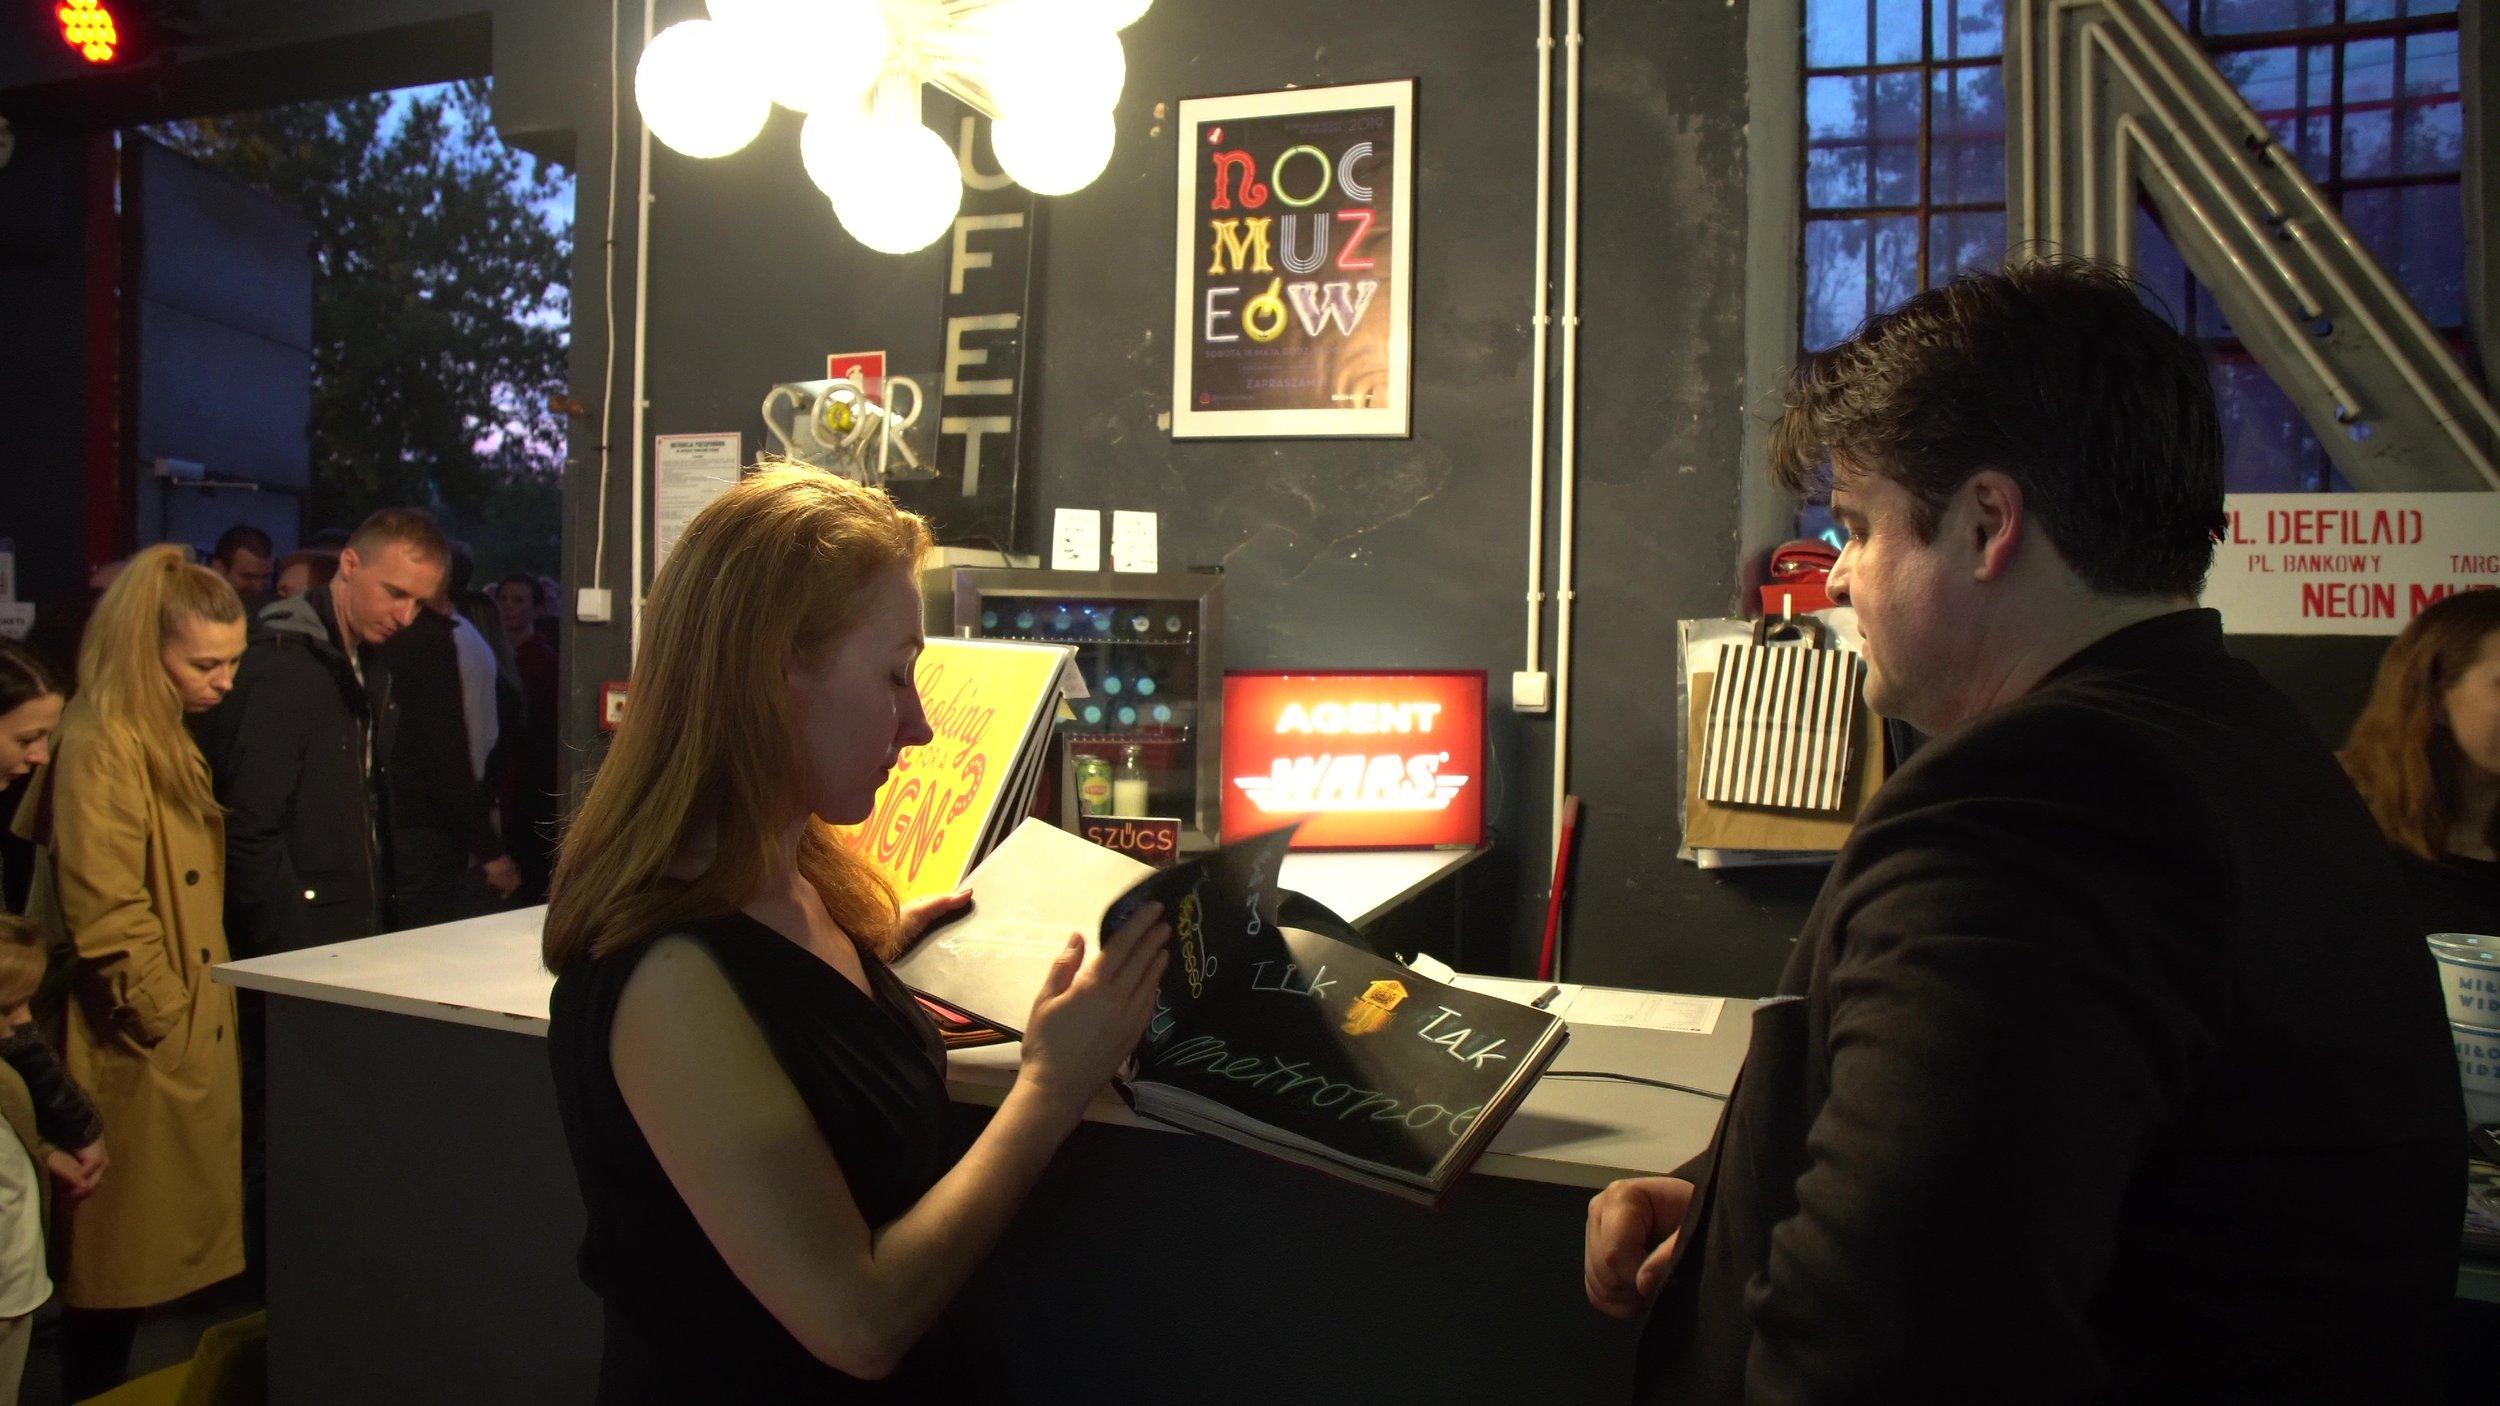 Ilona Karwińska e David Hill, i fondatori del Neon Muzeum.